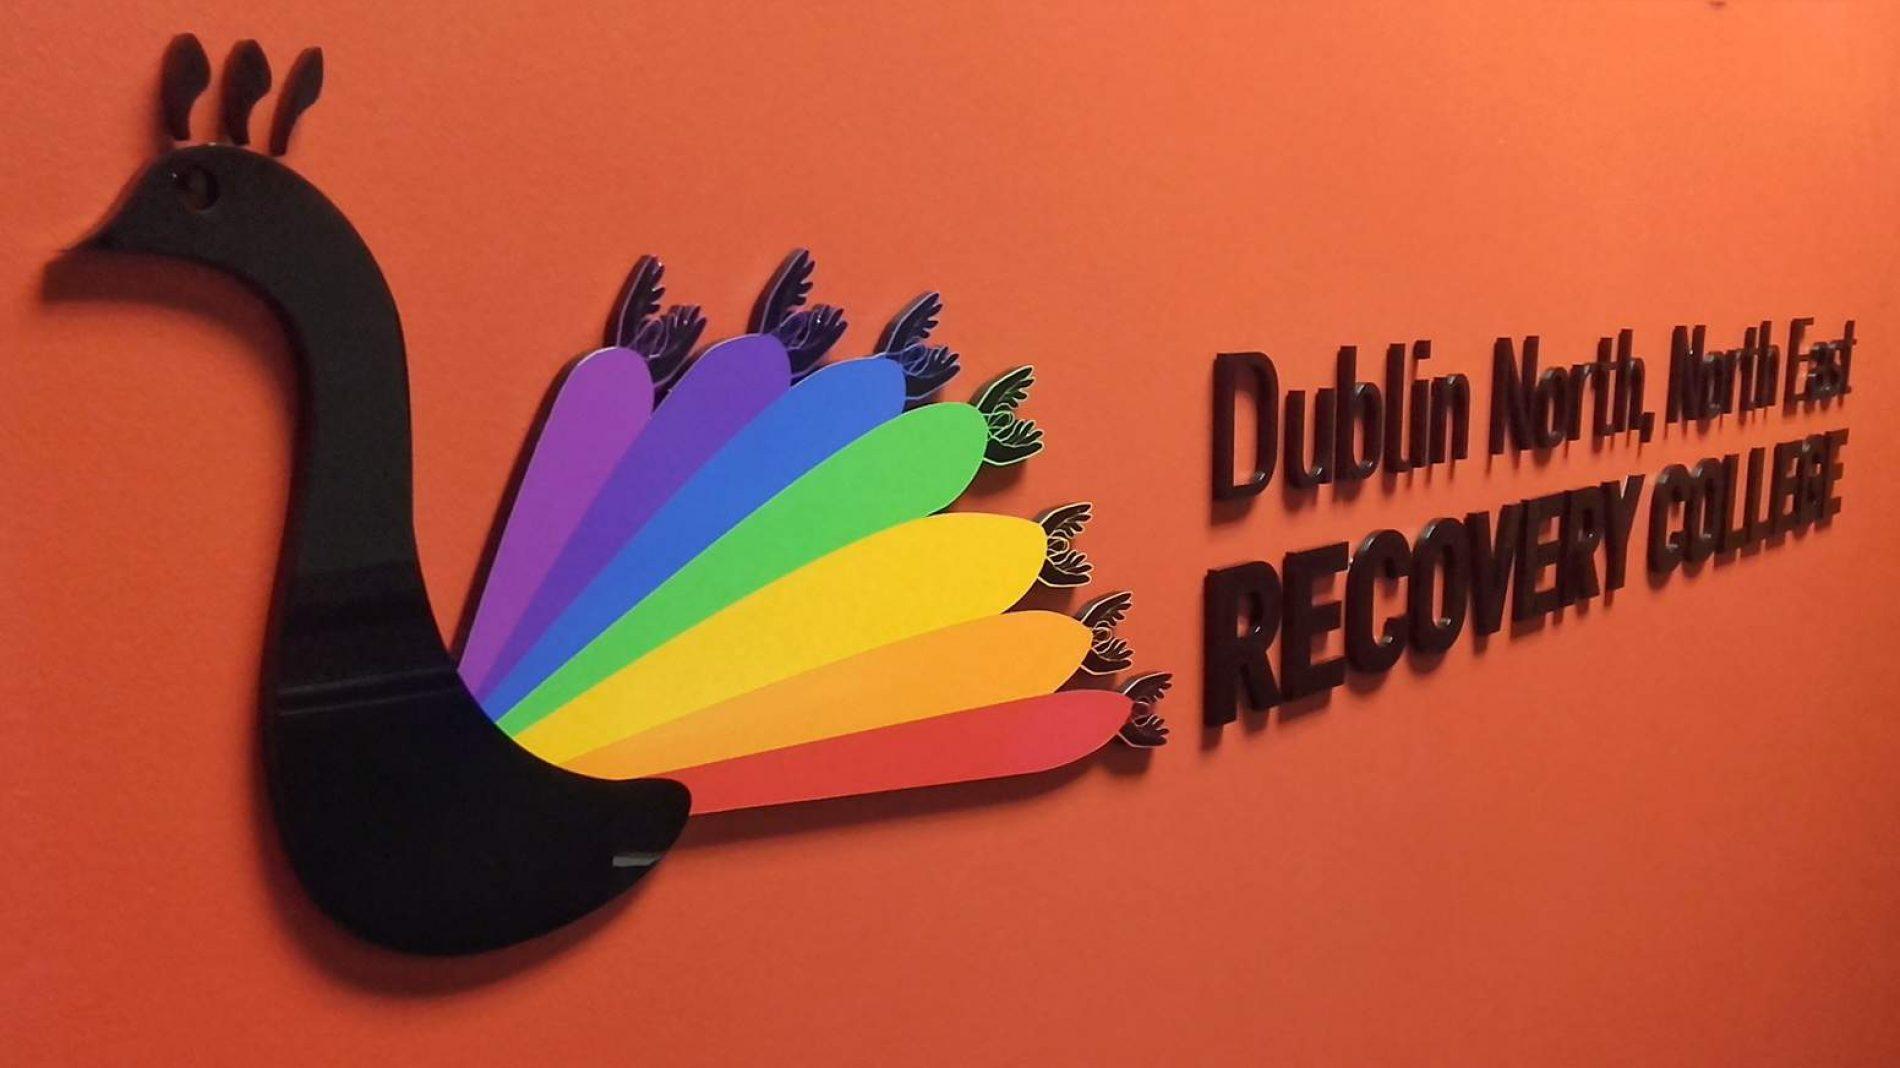 dublin recovery college logo